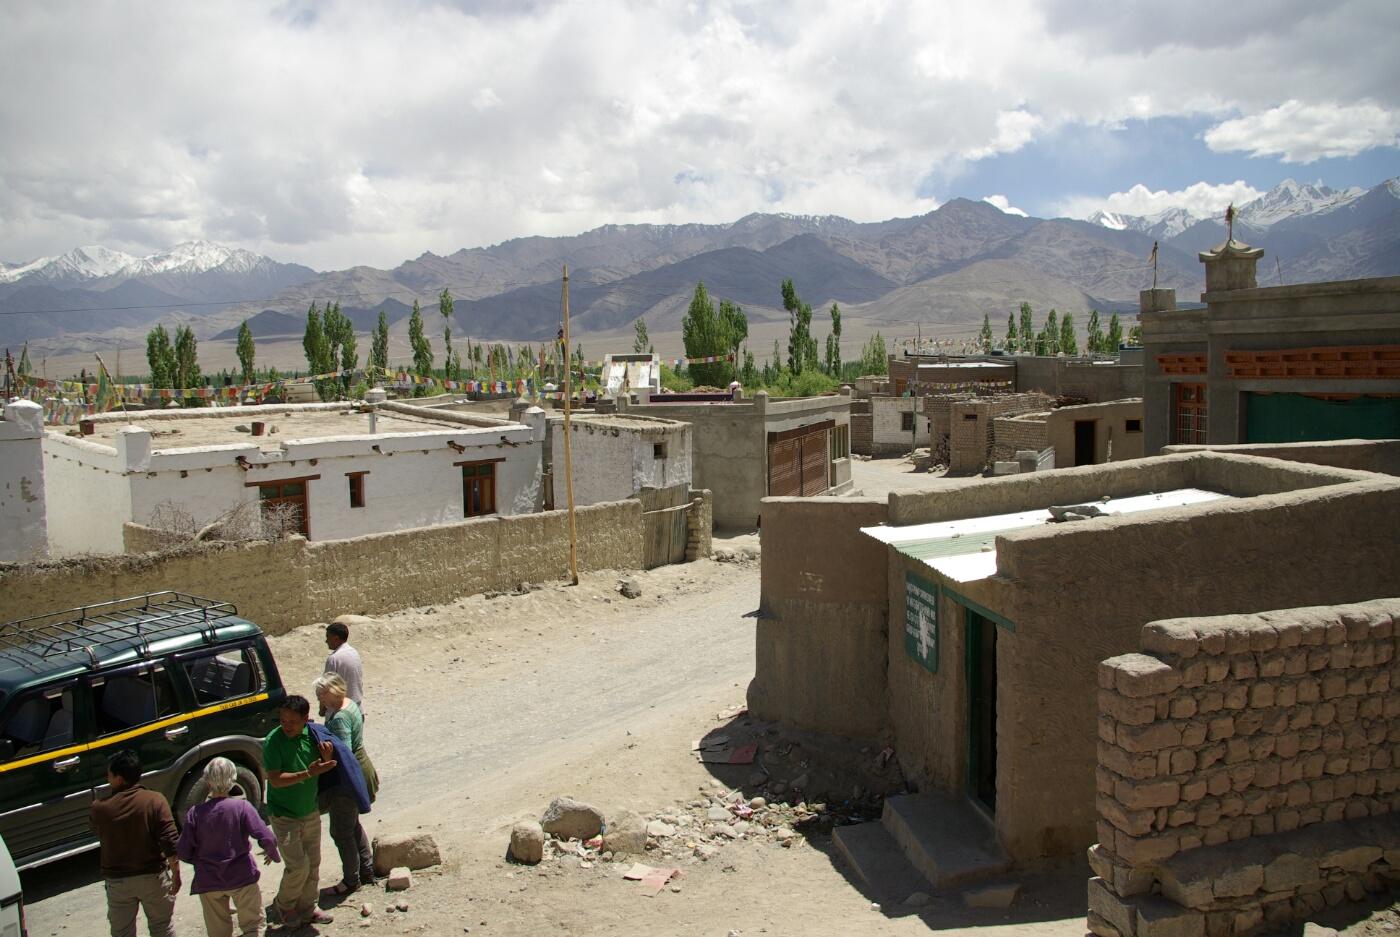 Choglamsar: In der Siedlung Choglamsar